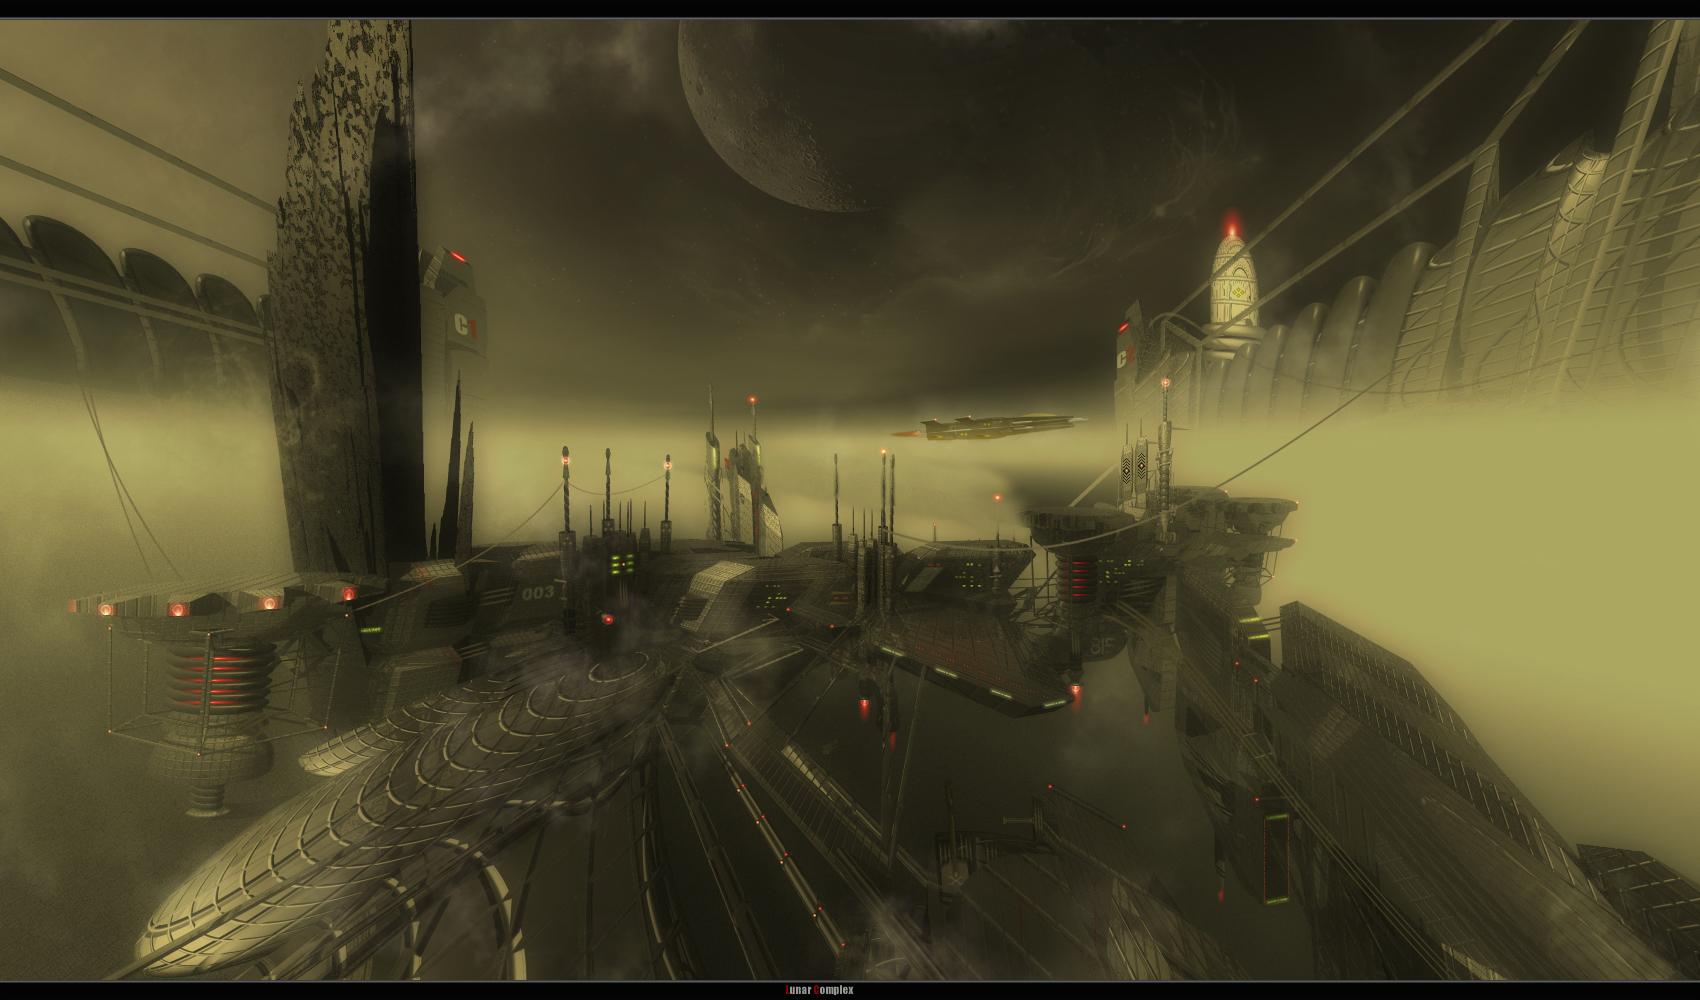 Lunar Complex by viperv6